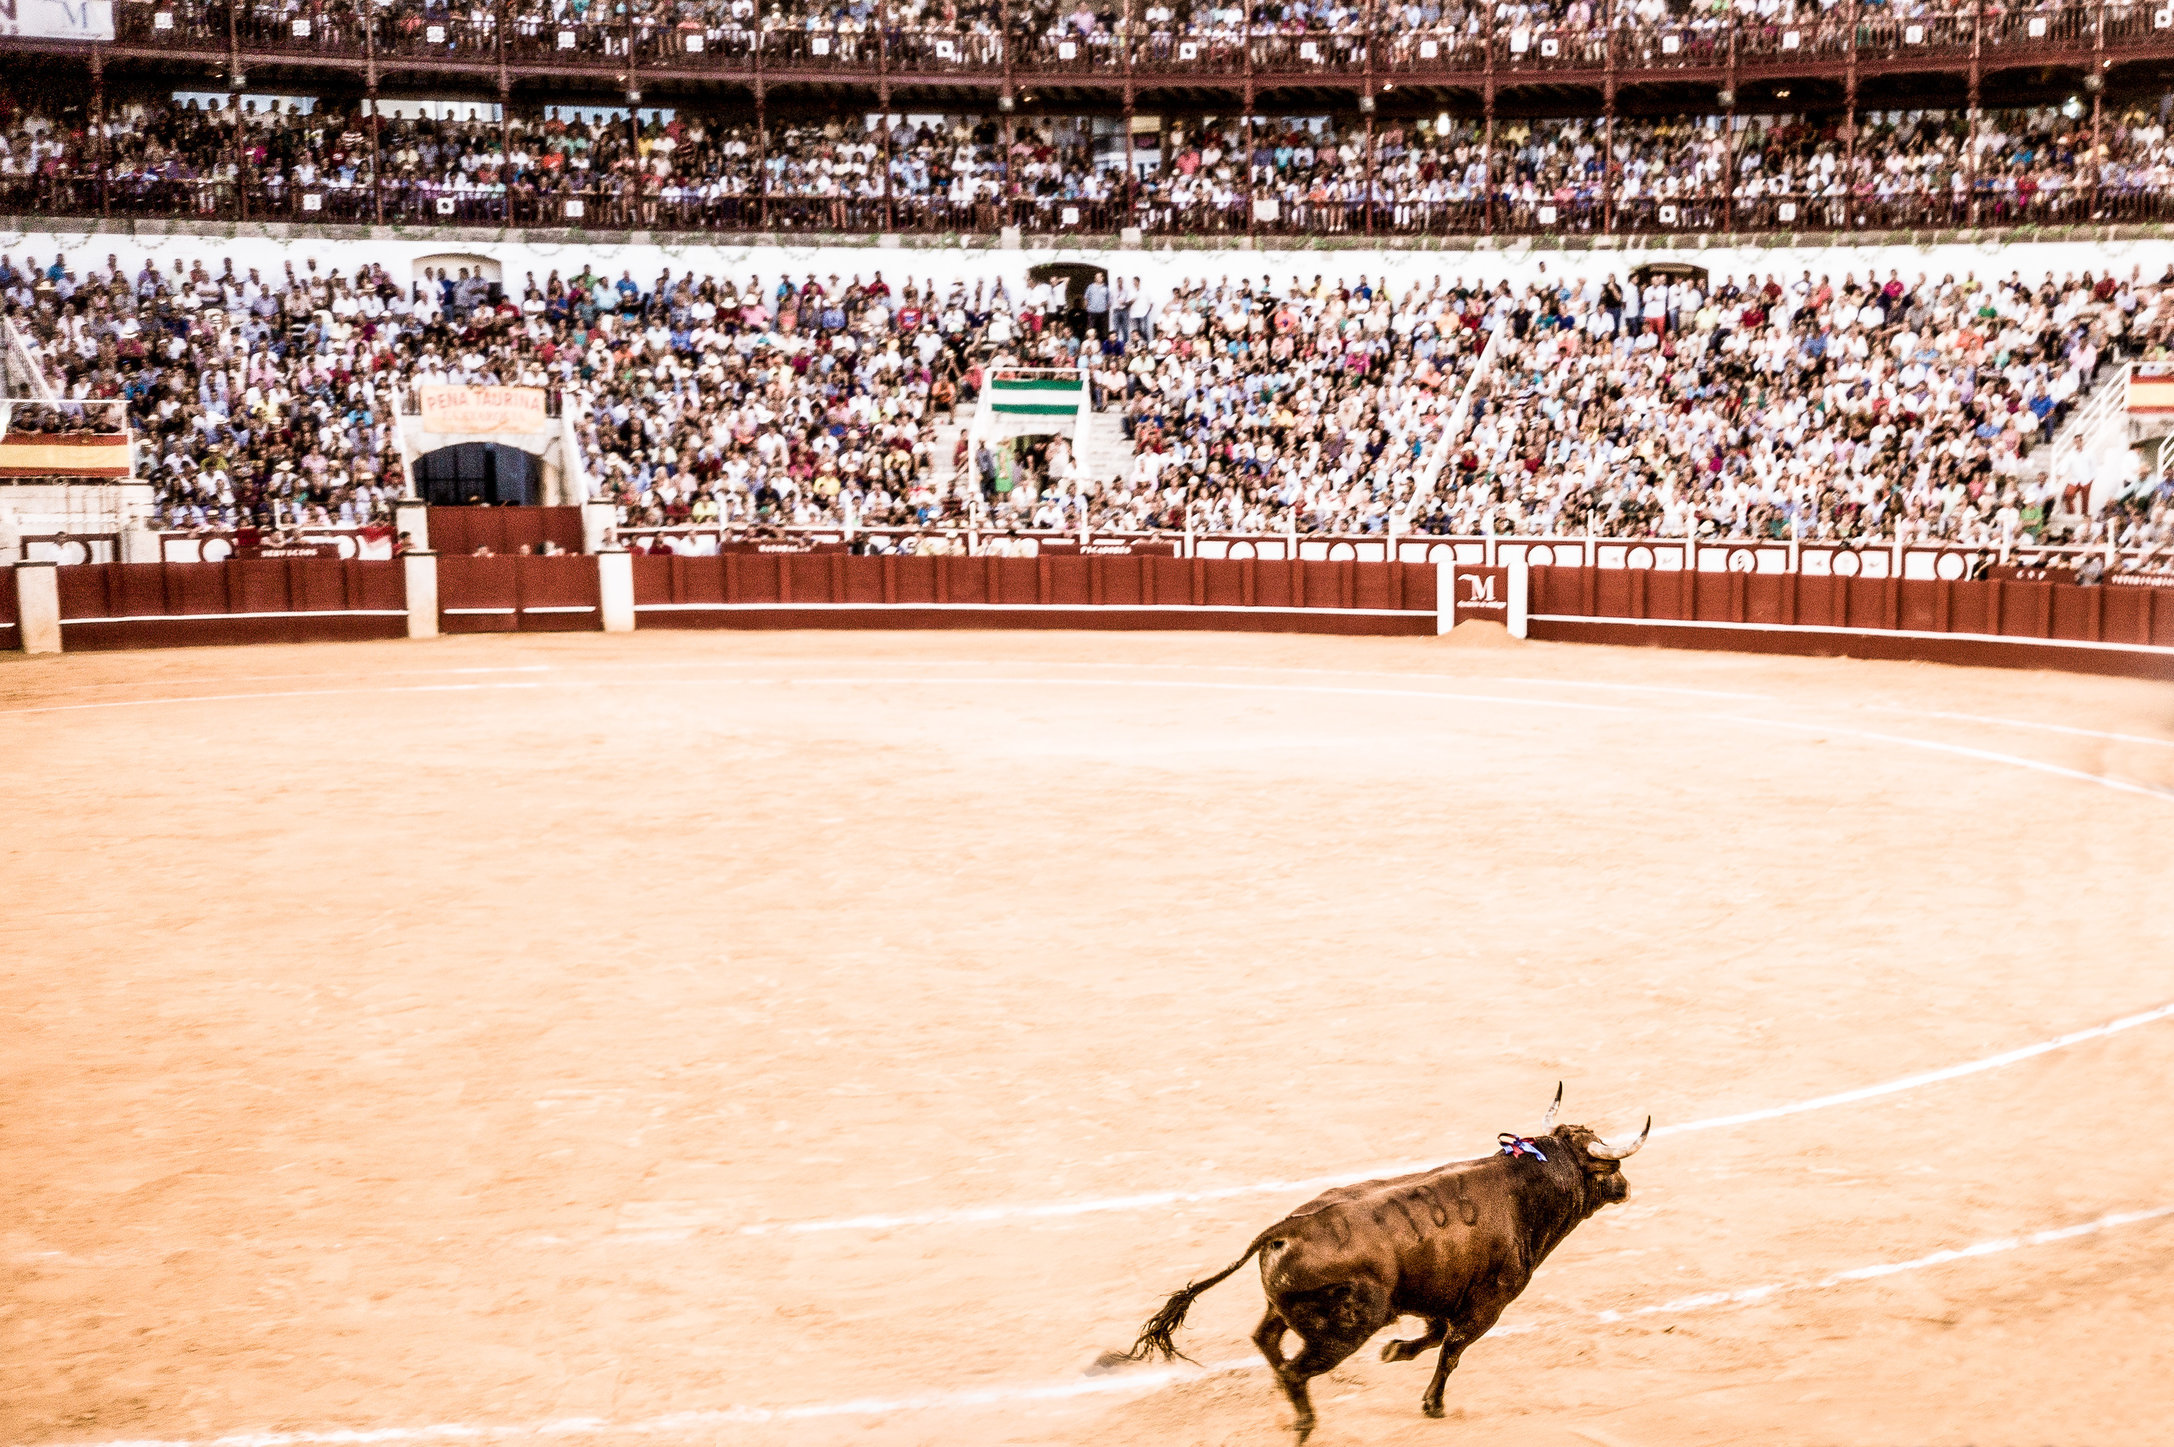 The Bullfight-186-bewerkt.jpg